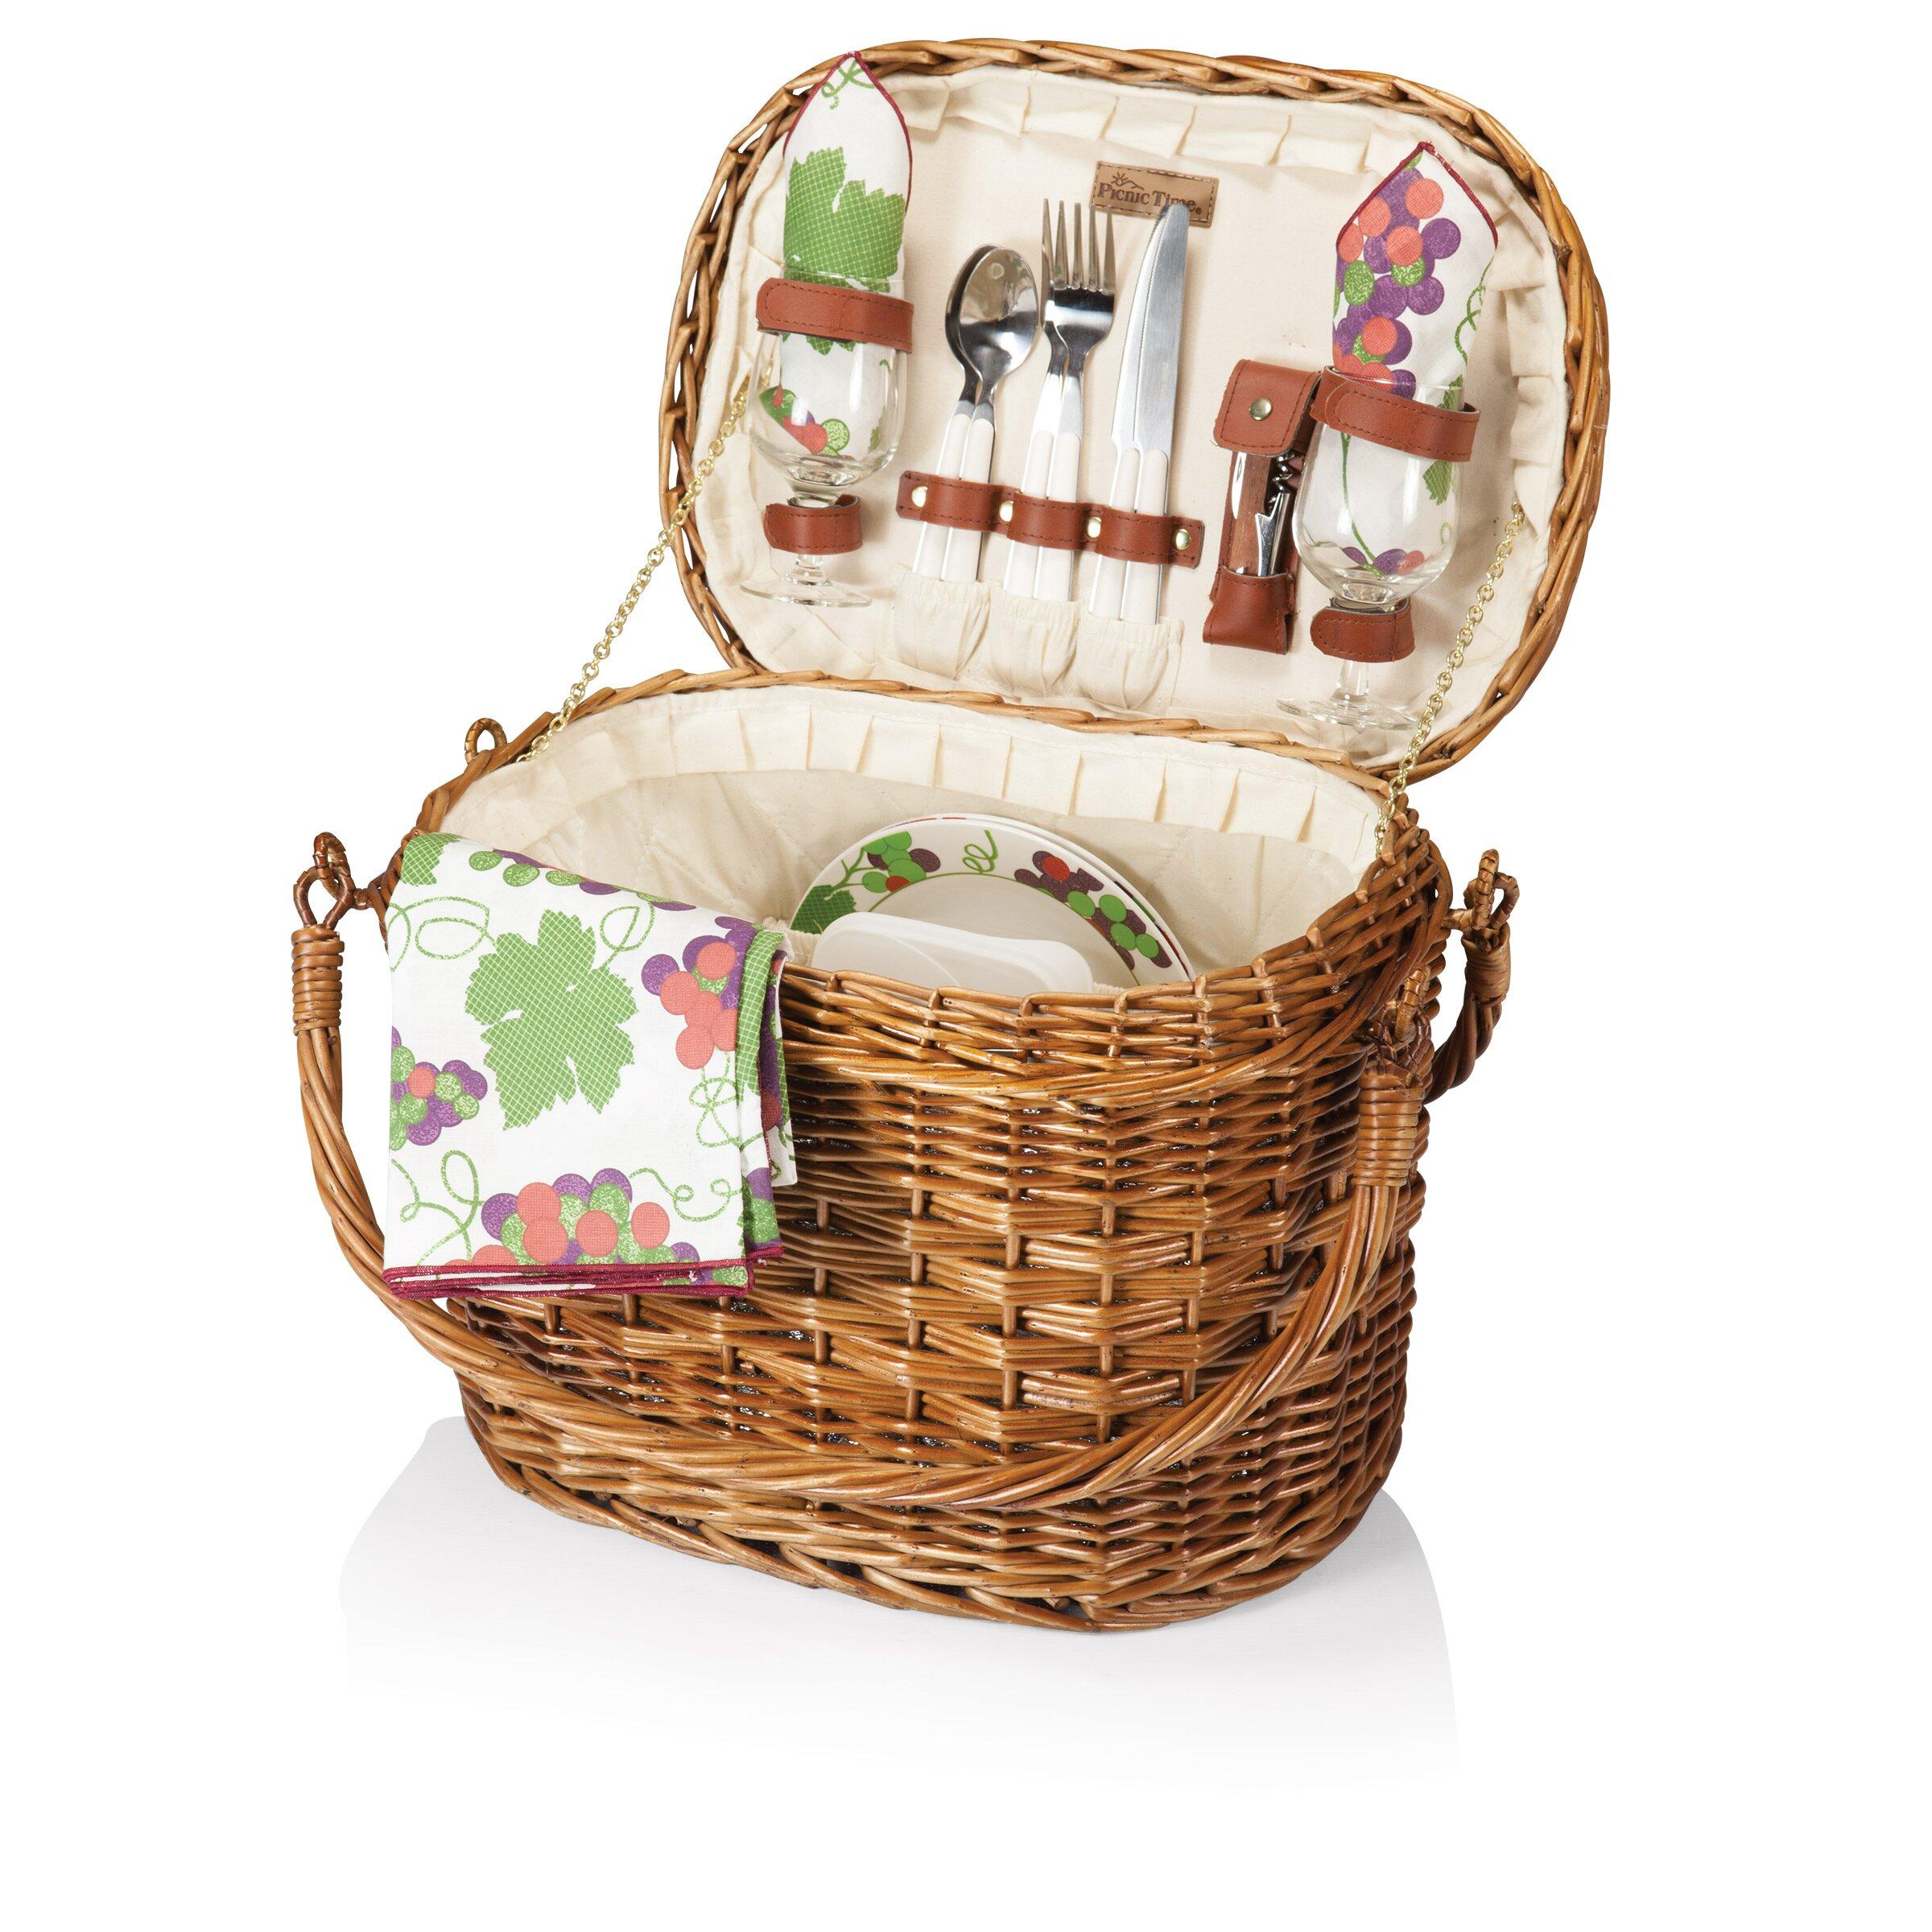 California King Size Bedroom Furniture Sets Picnic Time Romance Picnic Basket Amp Reviews Wayfair